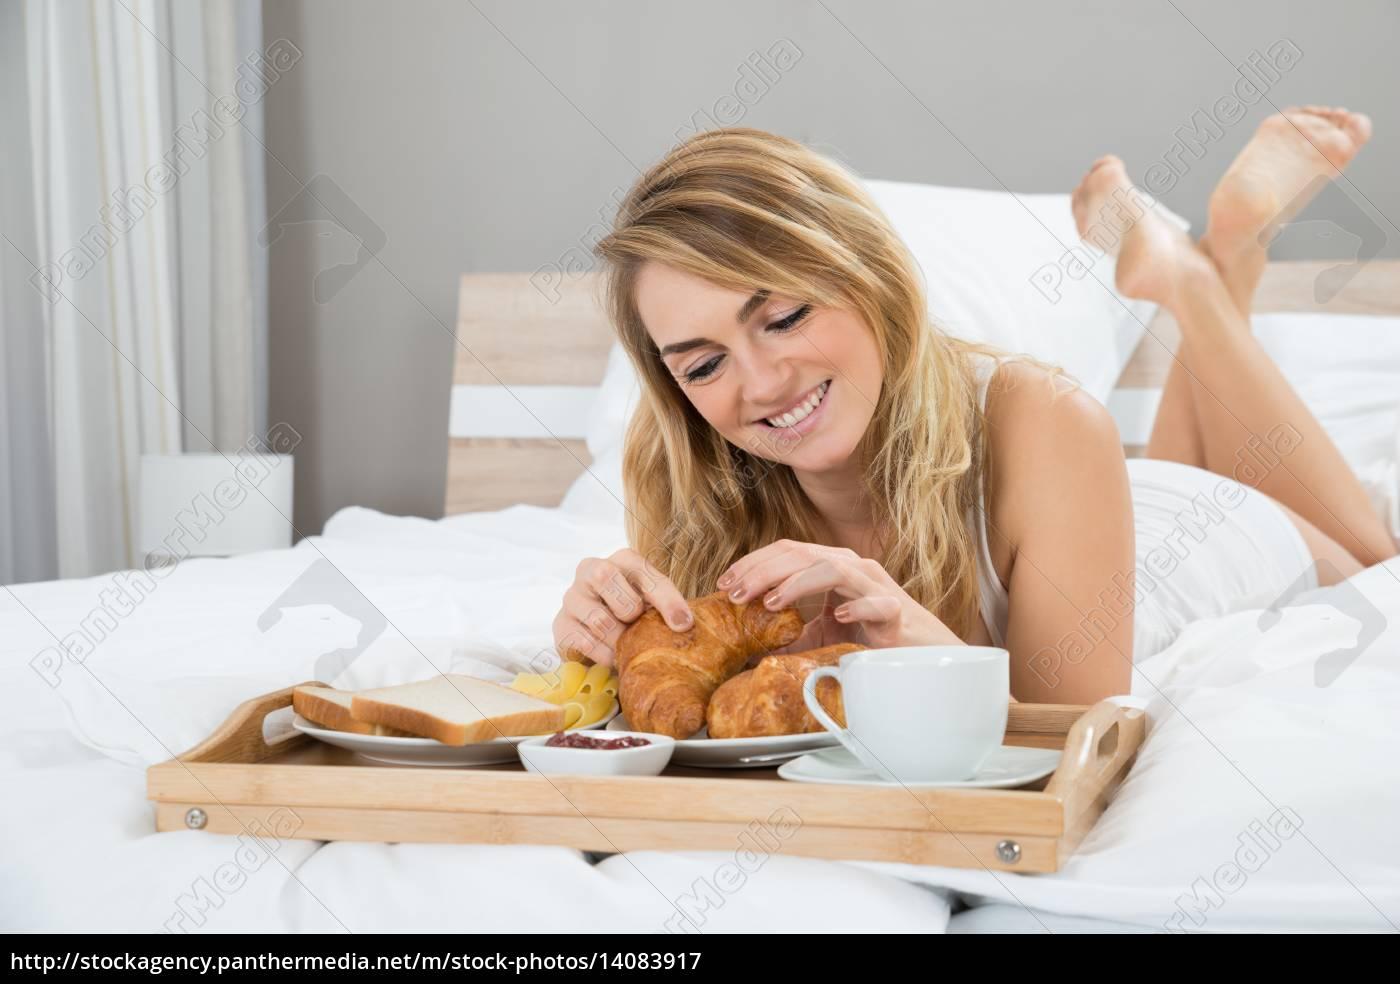 young, woman, having, breakfast - 14083917